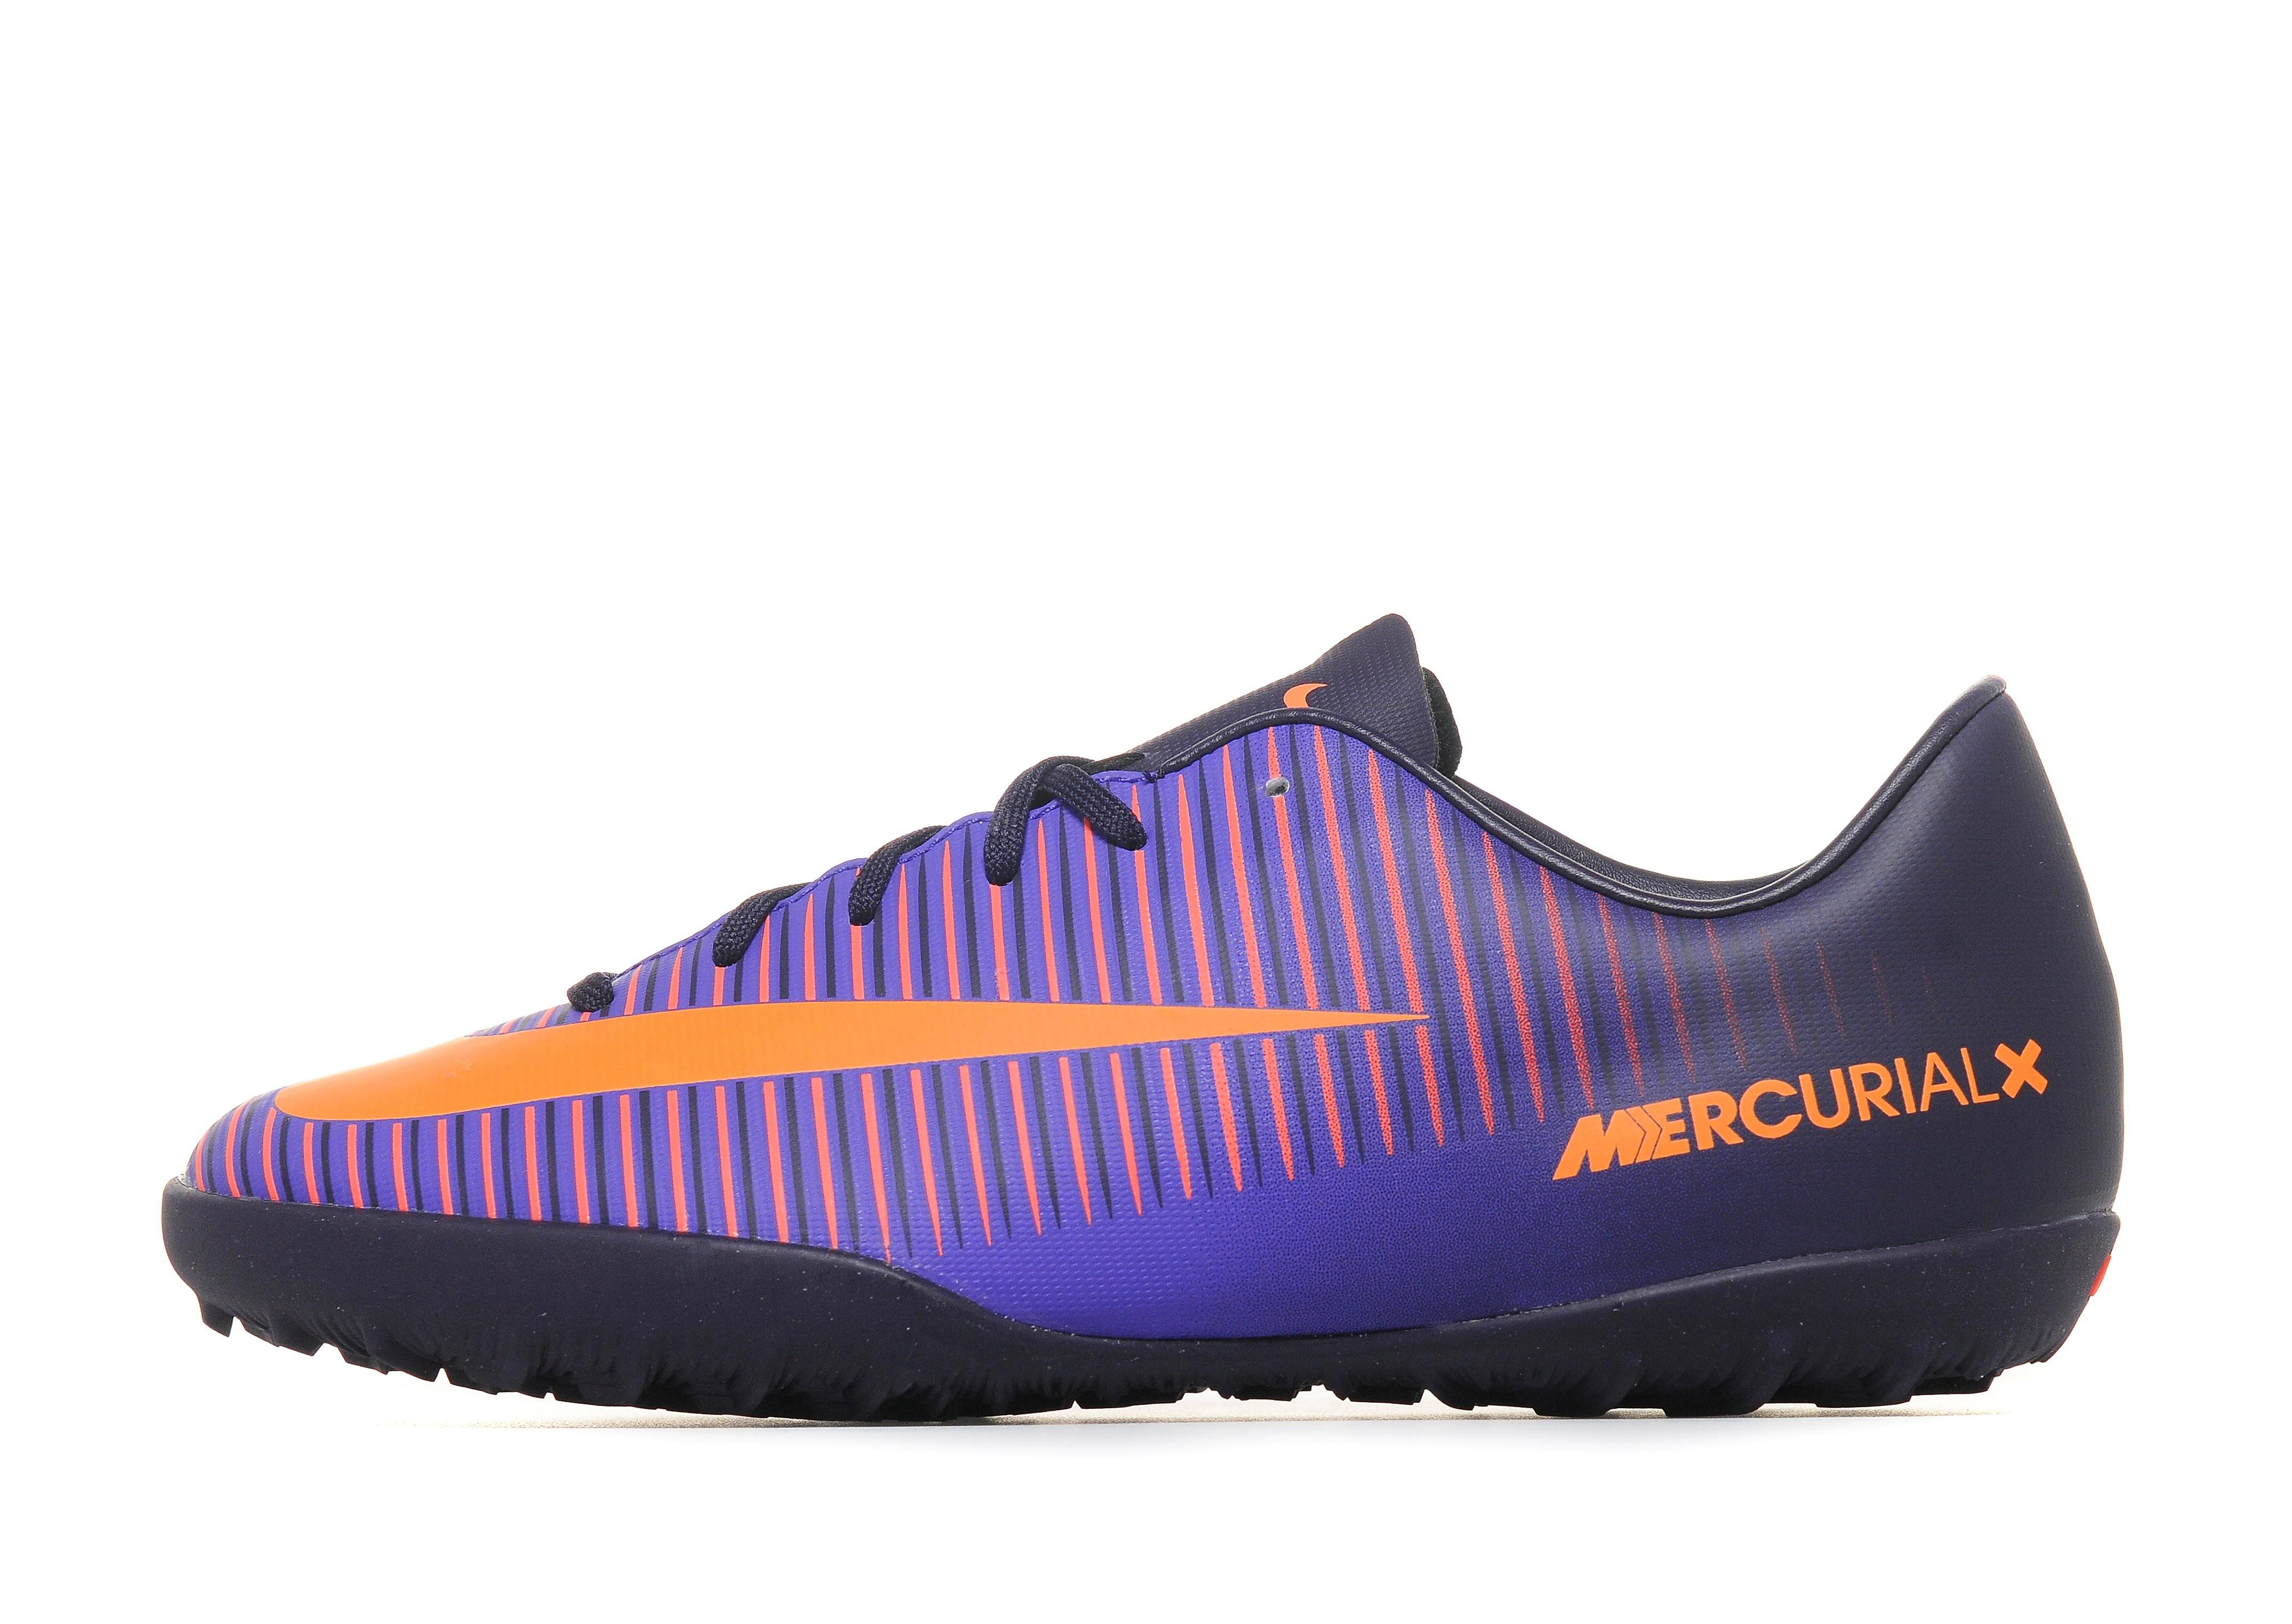 Nike Floodlight Mercurial Vapor XI Turf Junior